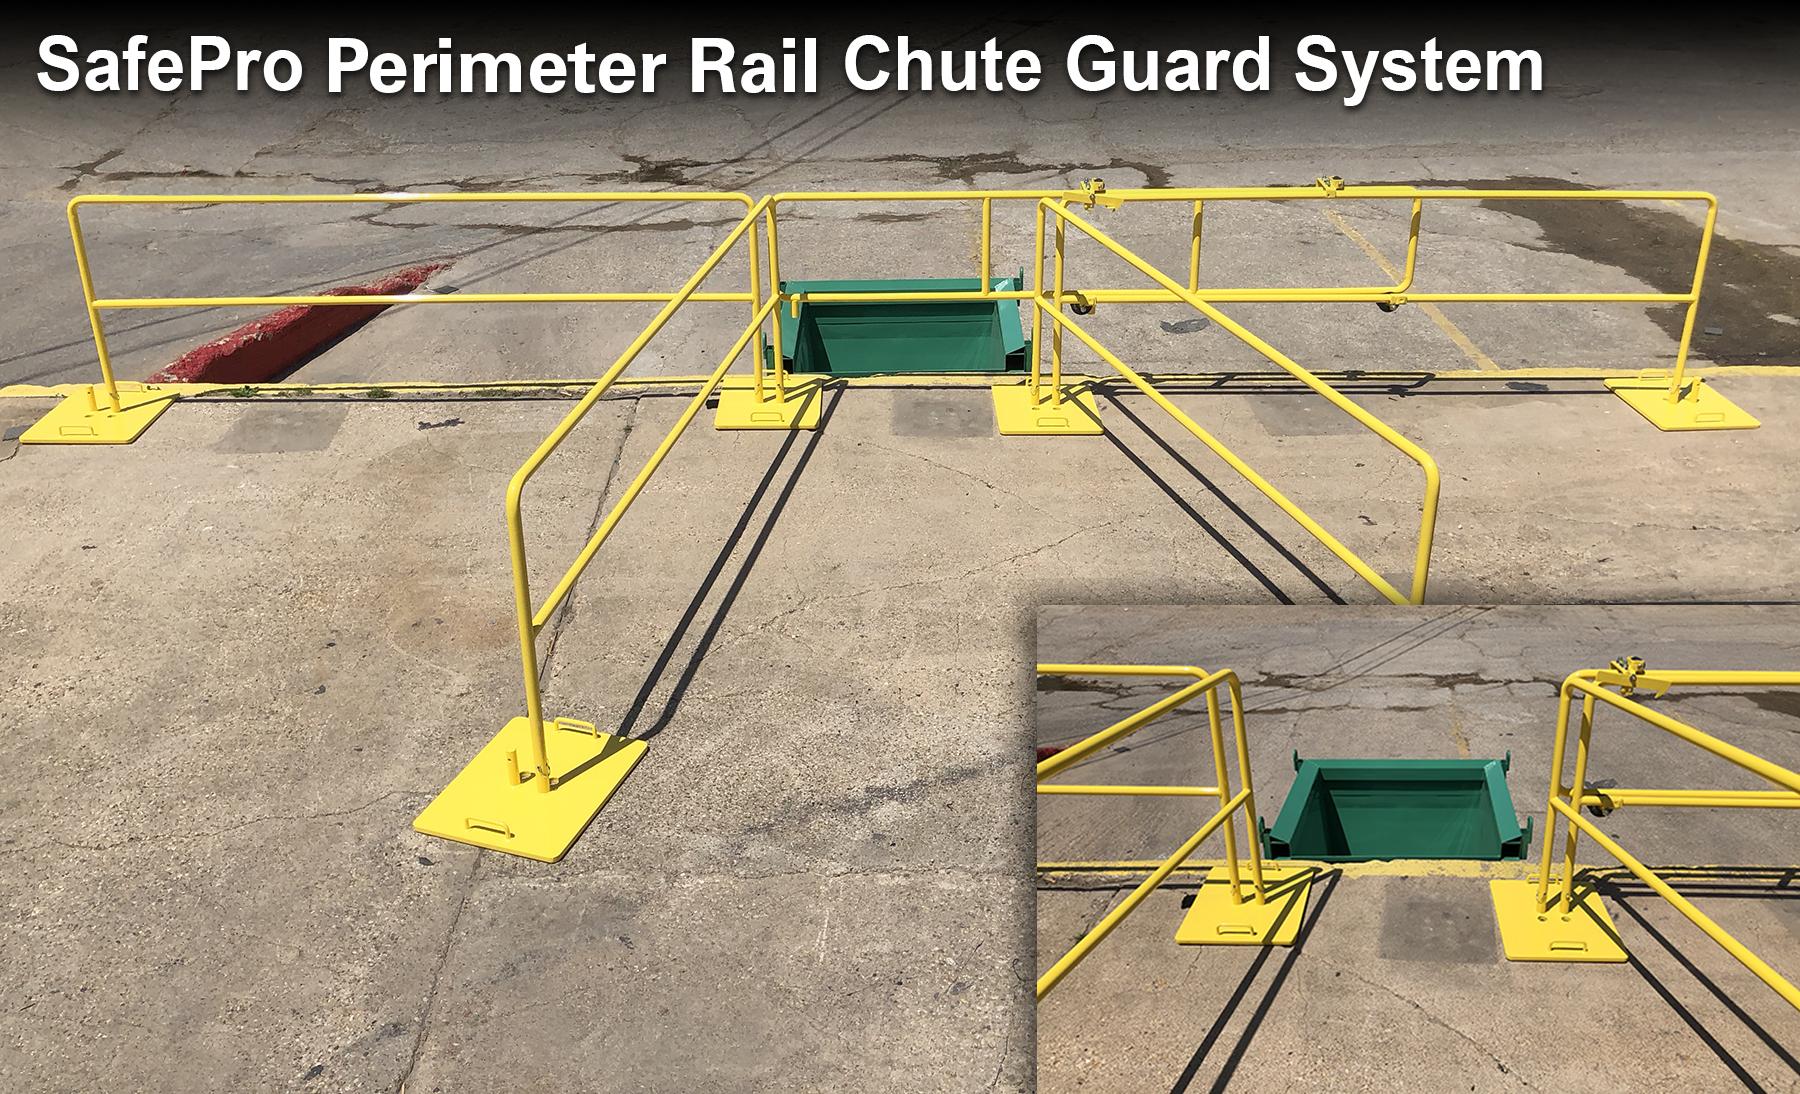 Step Ladder Gs Manufacturers Mail: New Perimeter Rail Chute Guard System Meets OSHA